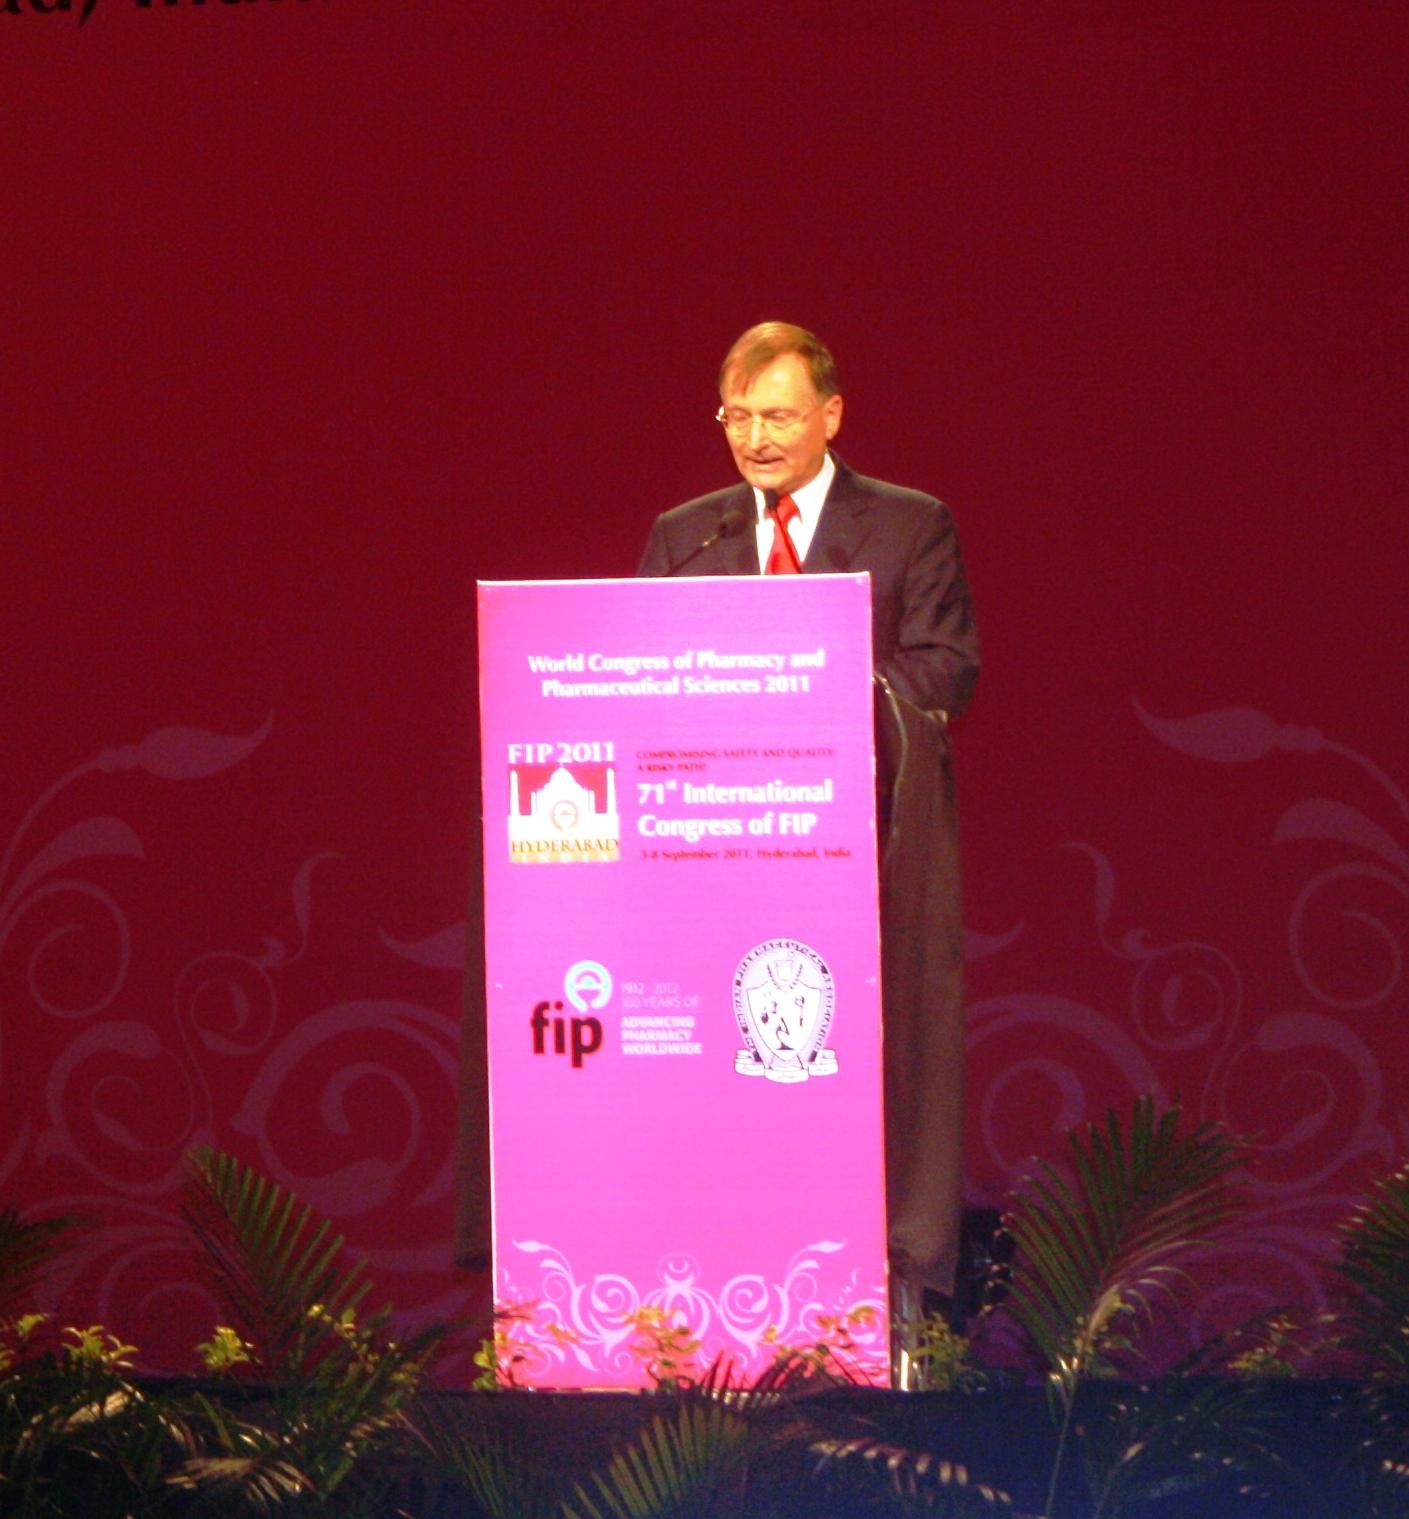 Ton Hoek at FIP Annual Congress 2012